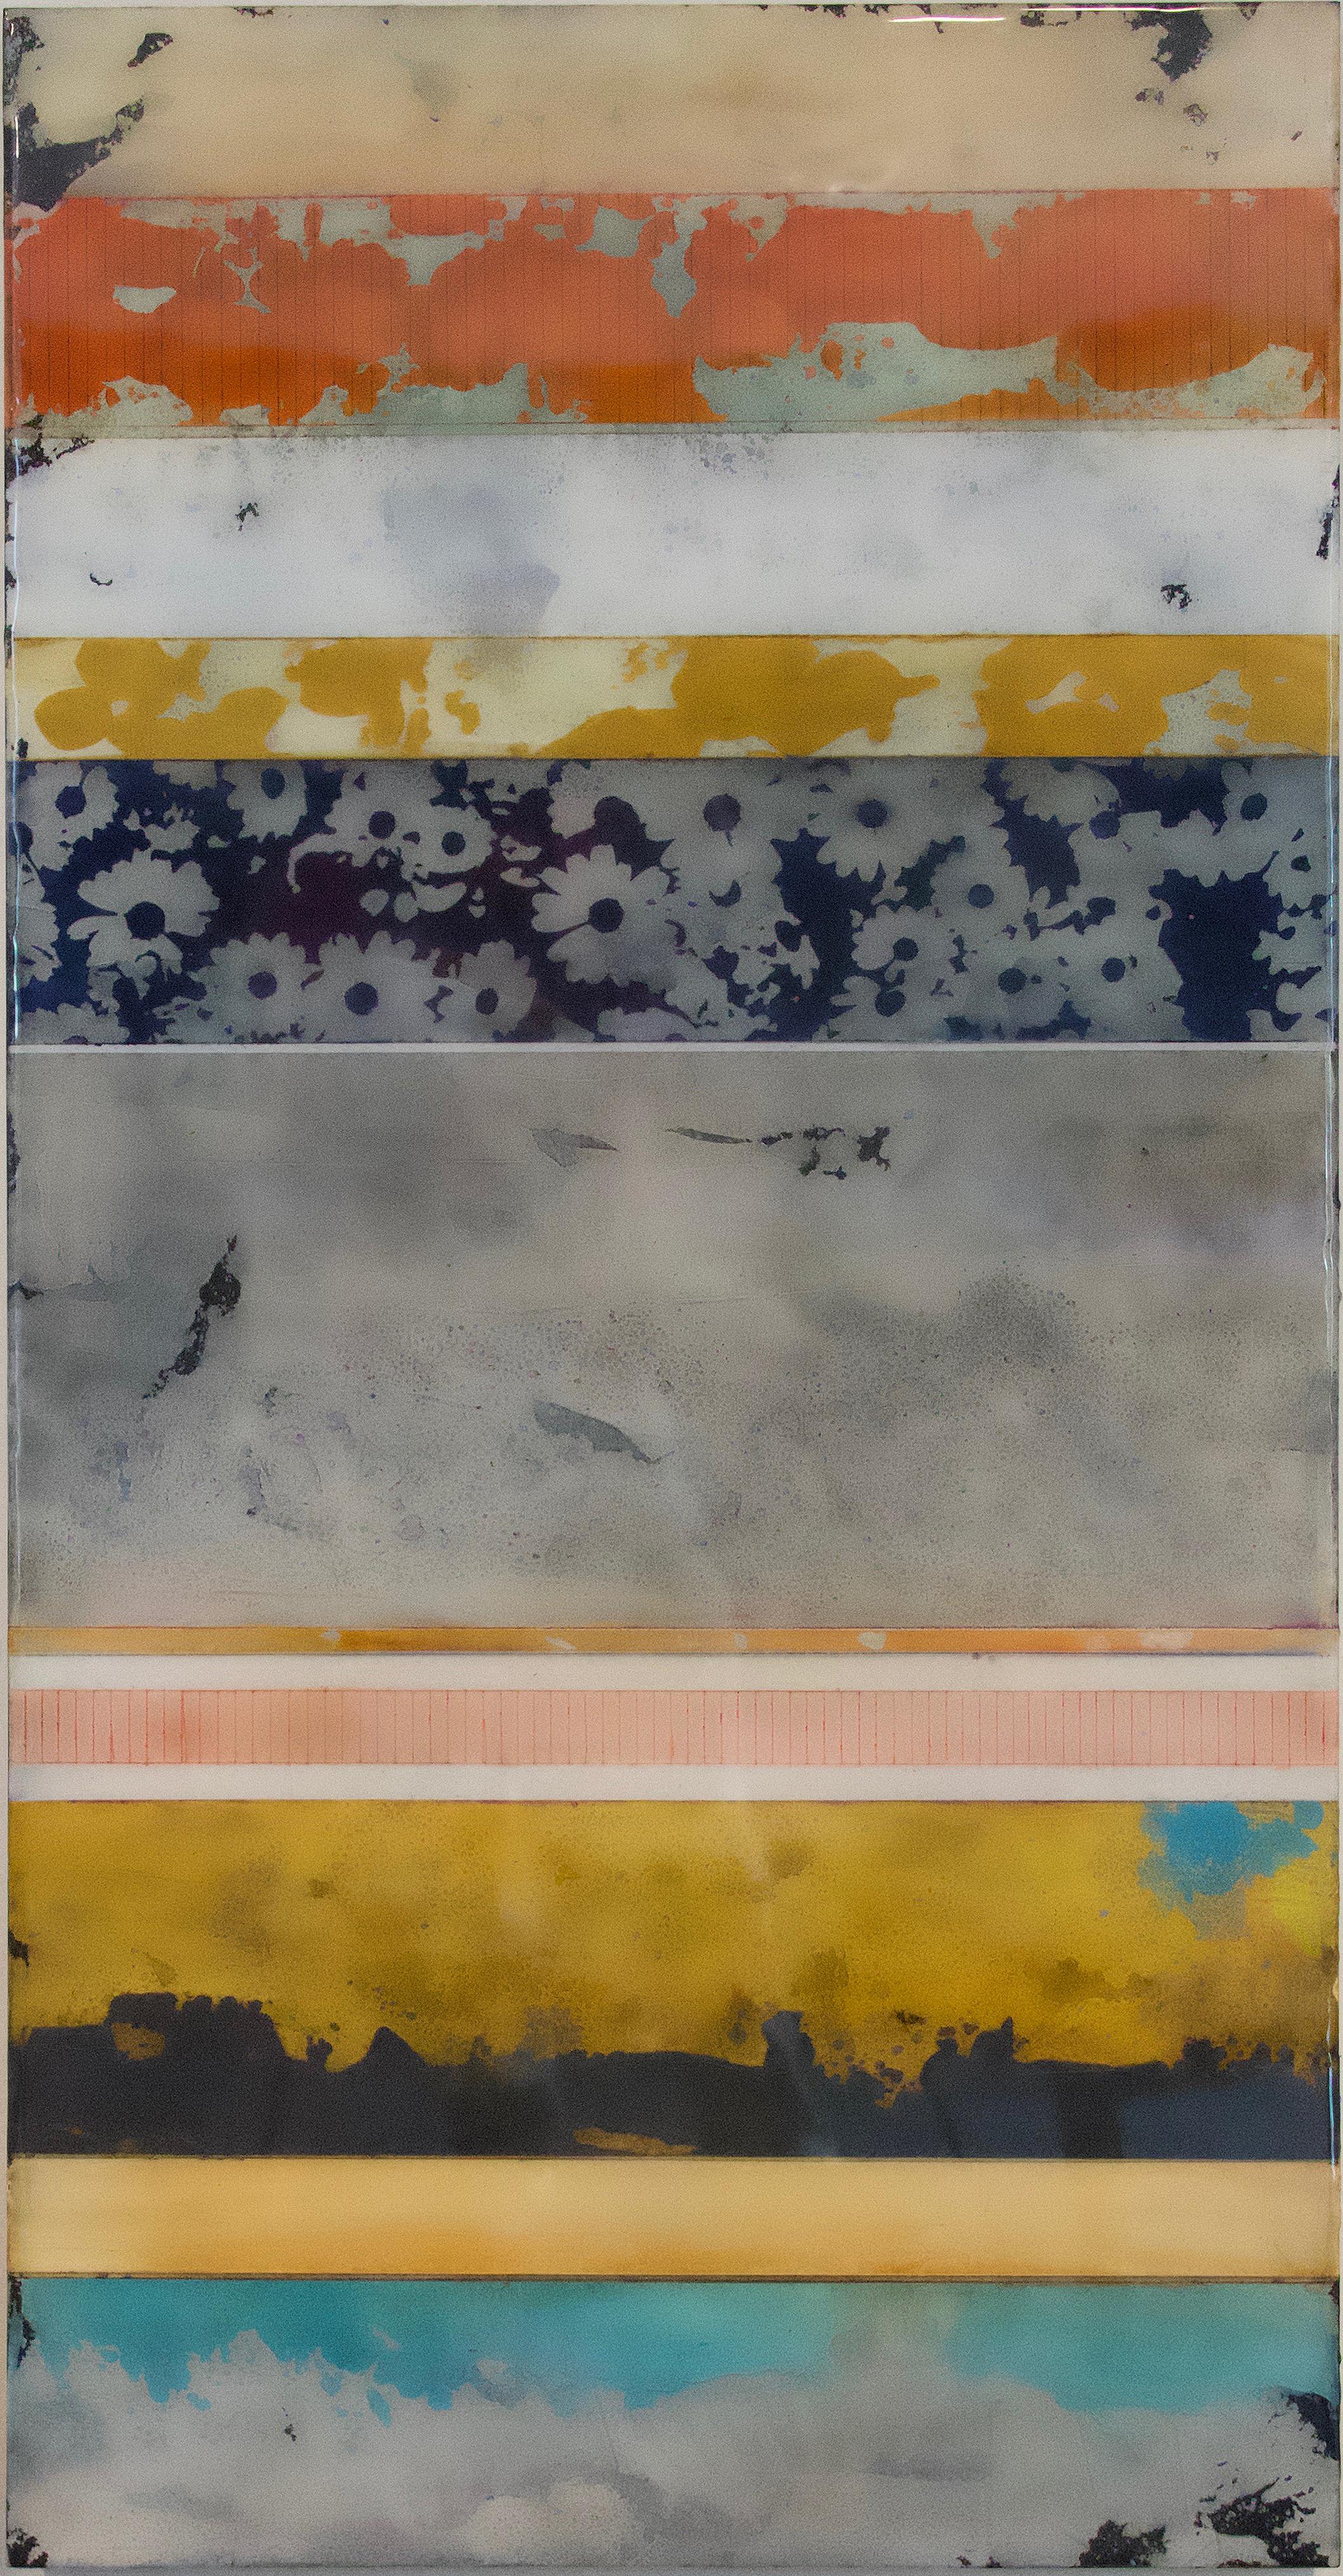 Daisies 3 by Ken Sloan